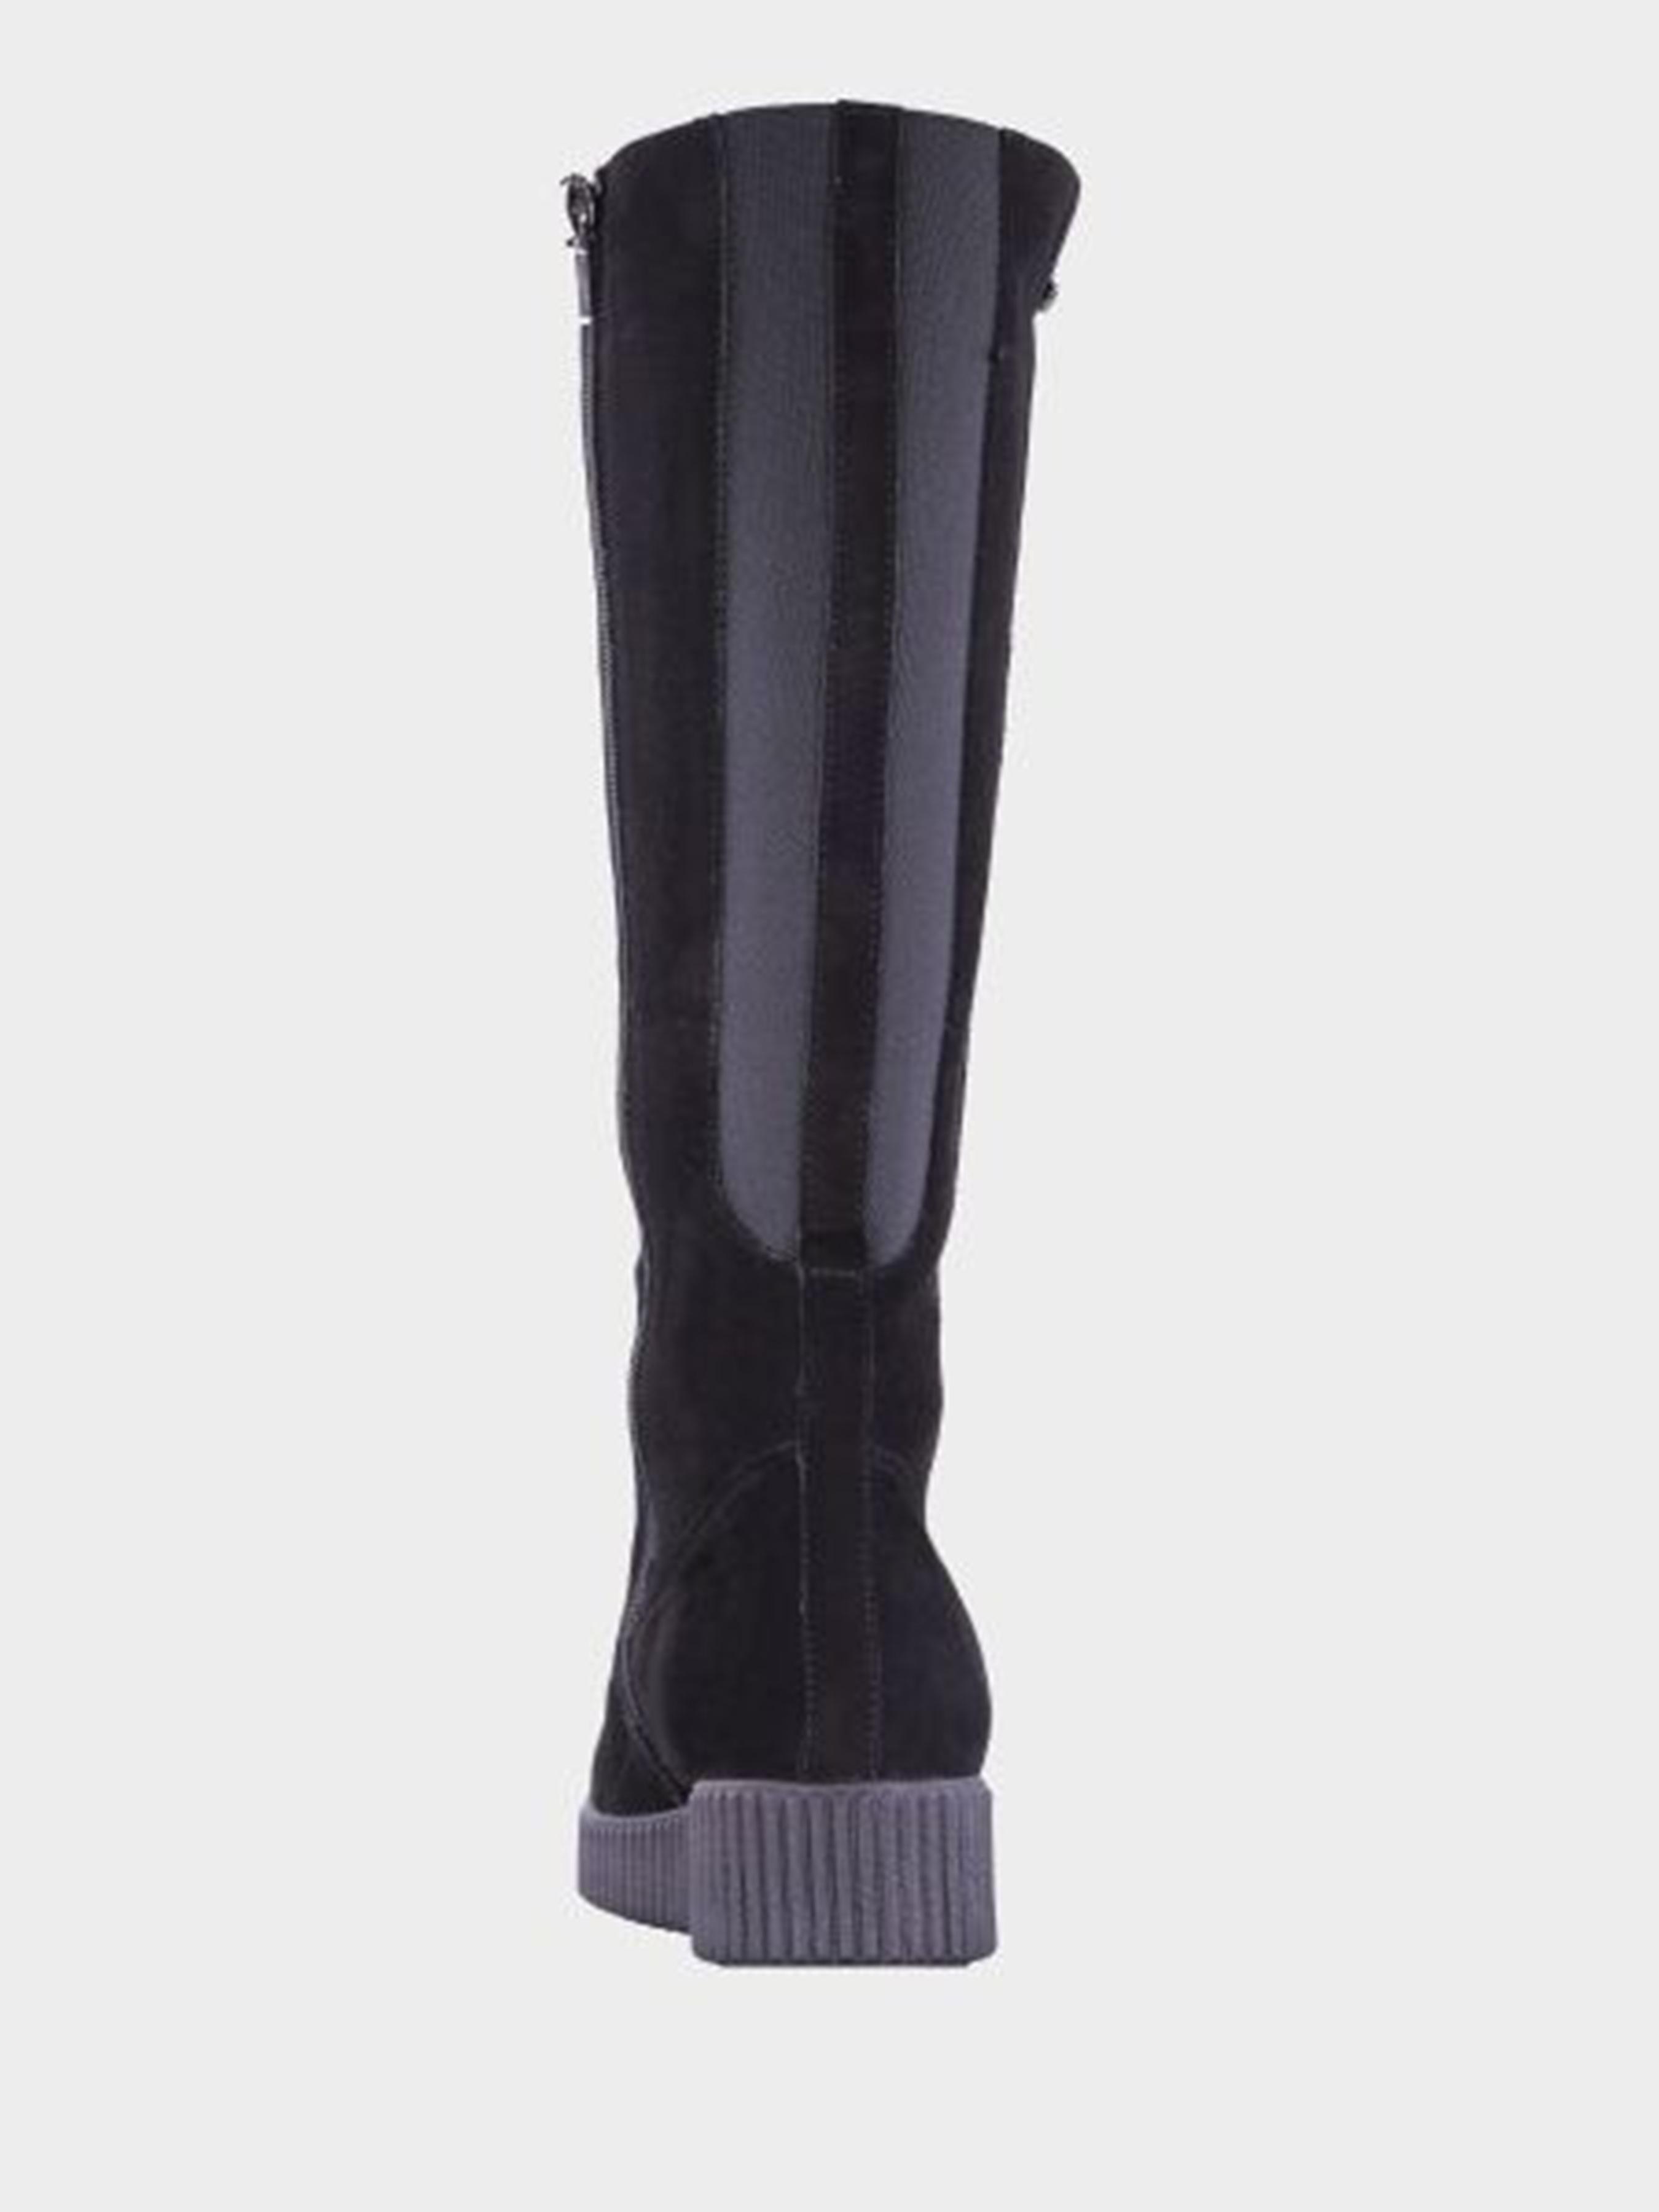 Сапоги для женщин Стептер 9K70 брендовые, 2017